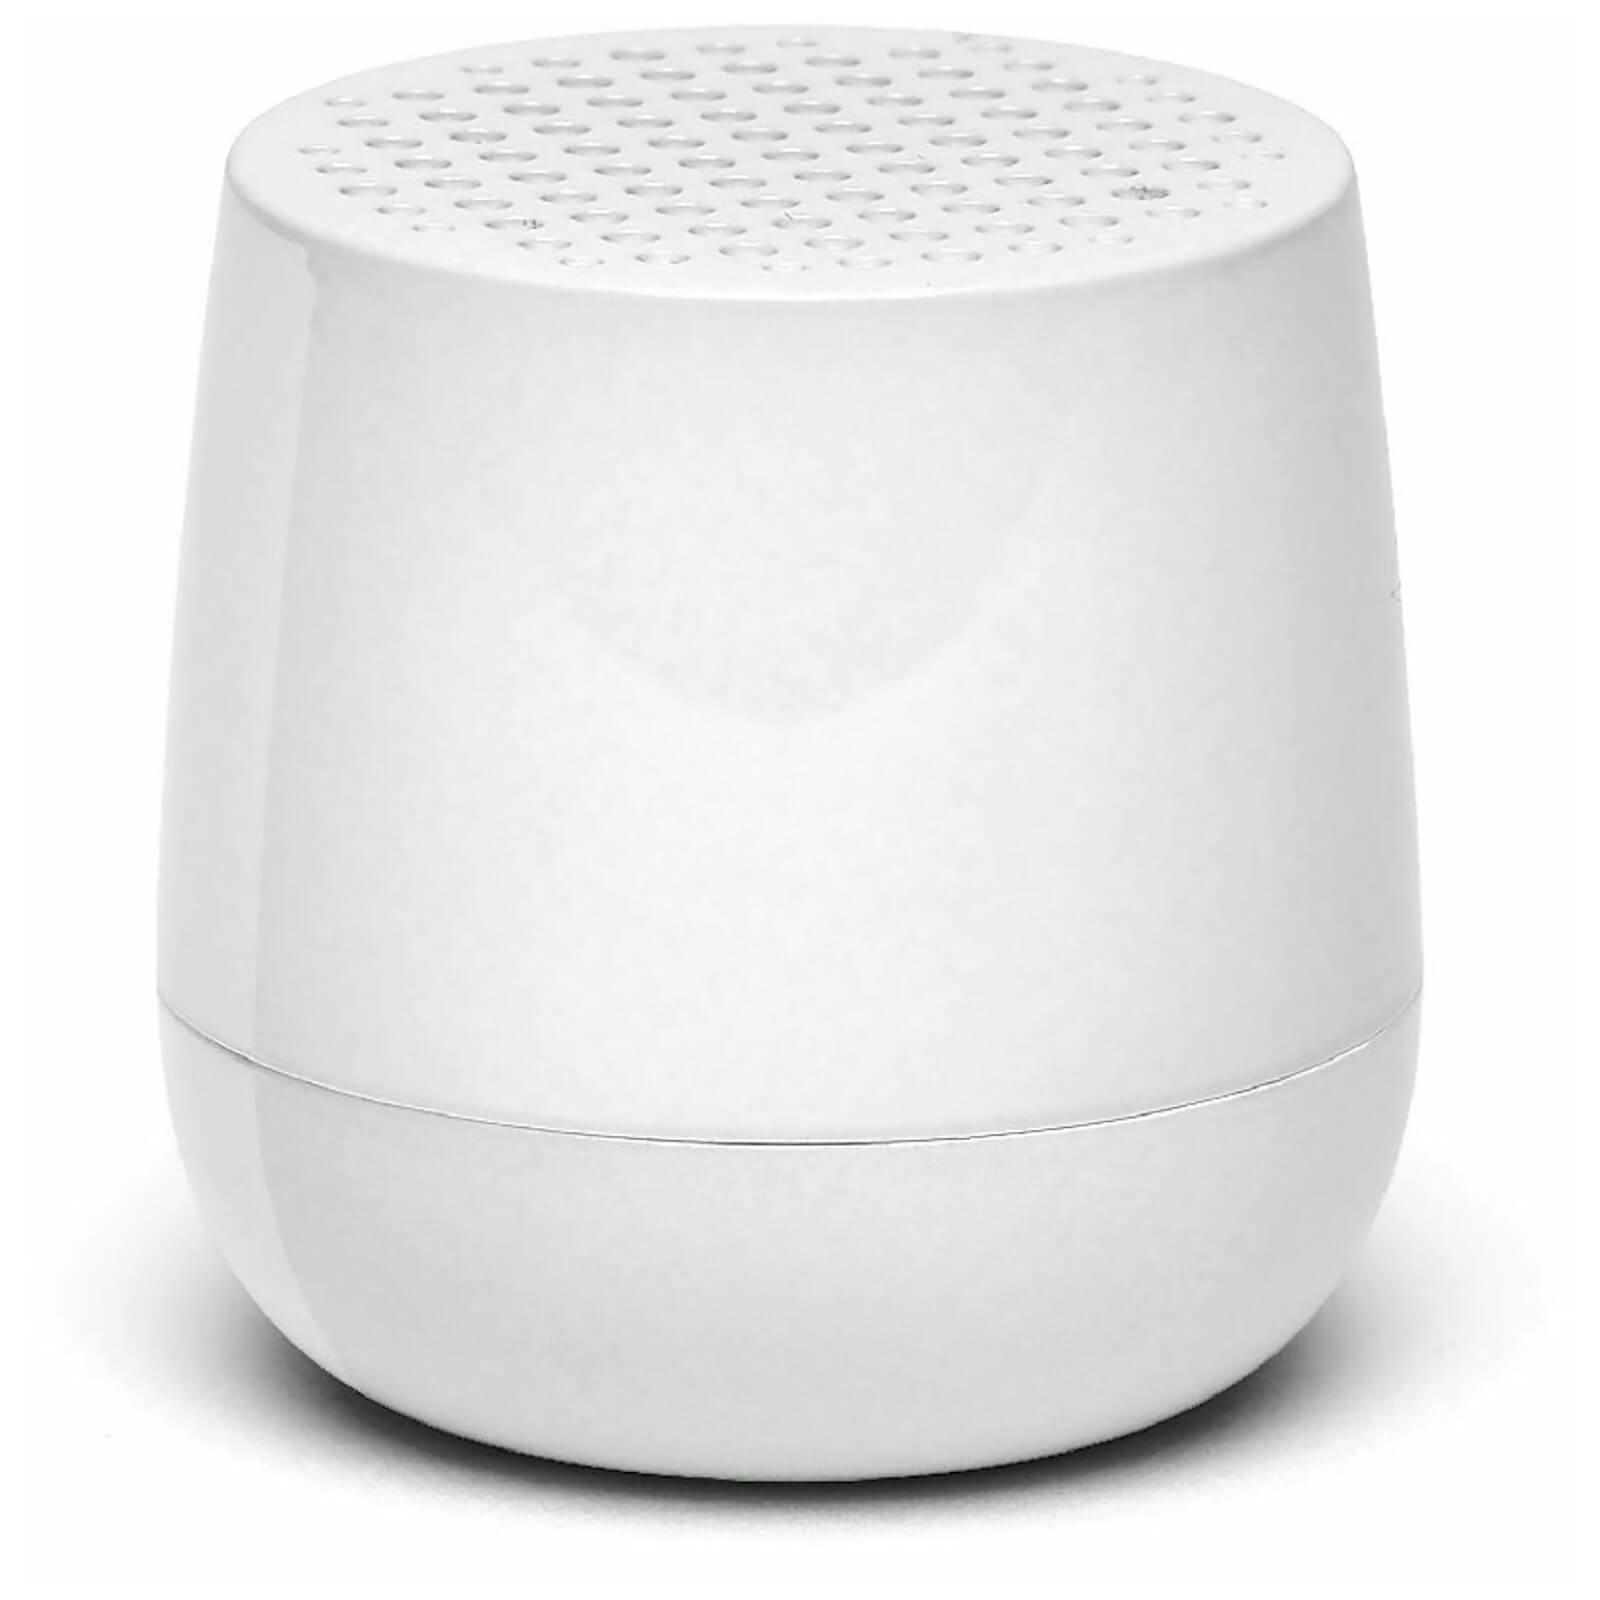 Lexon MINO Glossy Bluetooth Speaker - ABS Glossy White